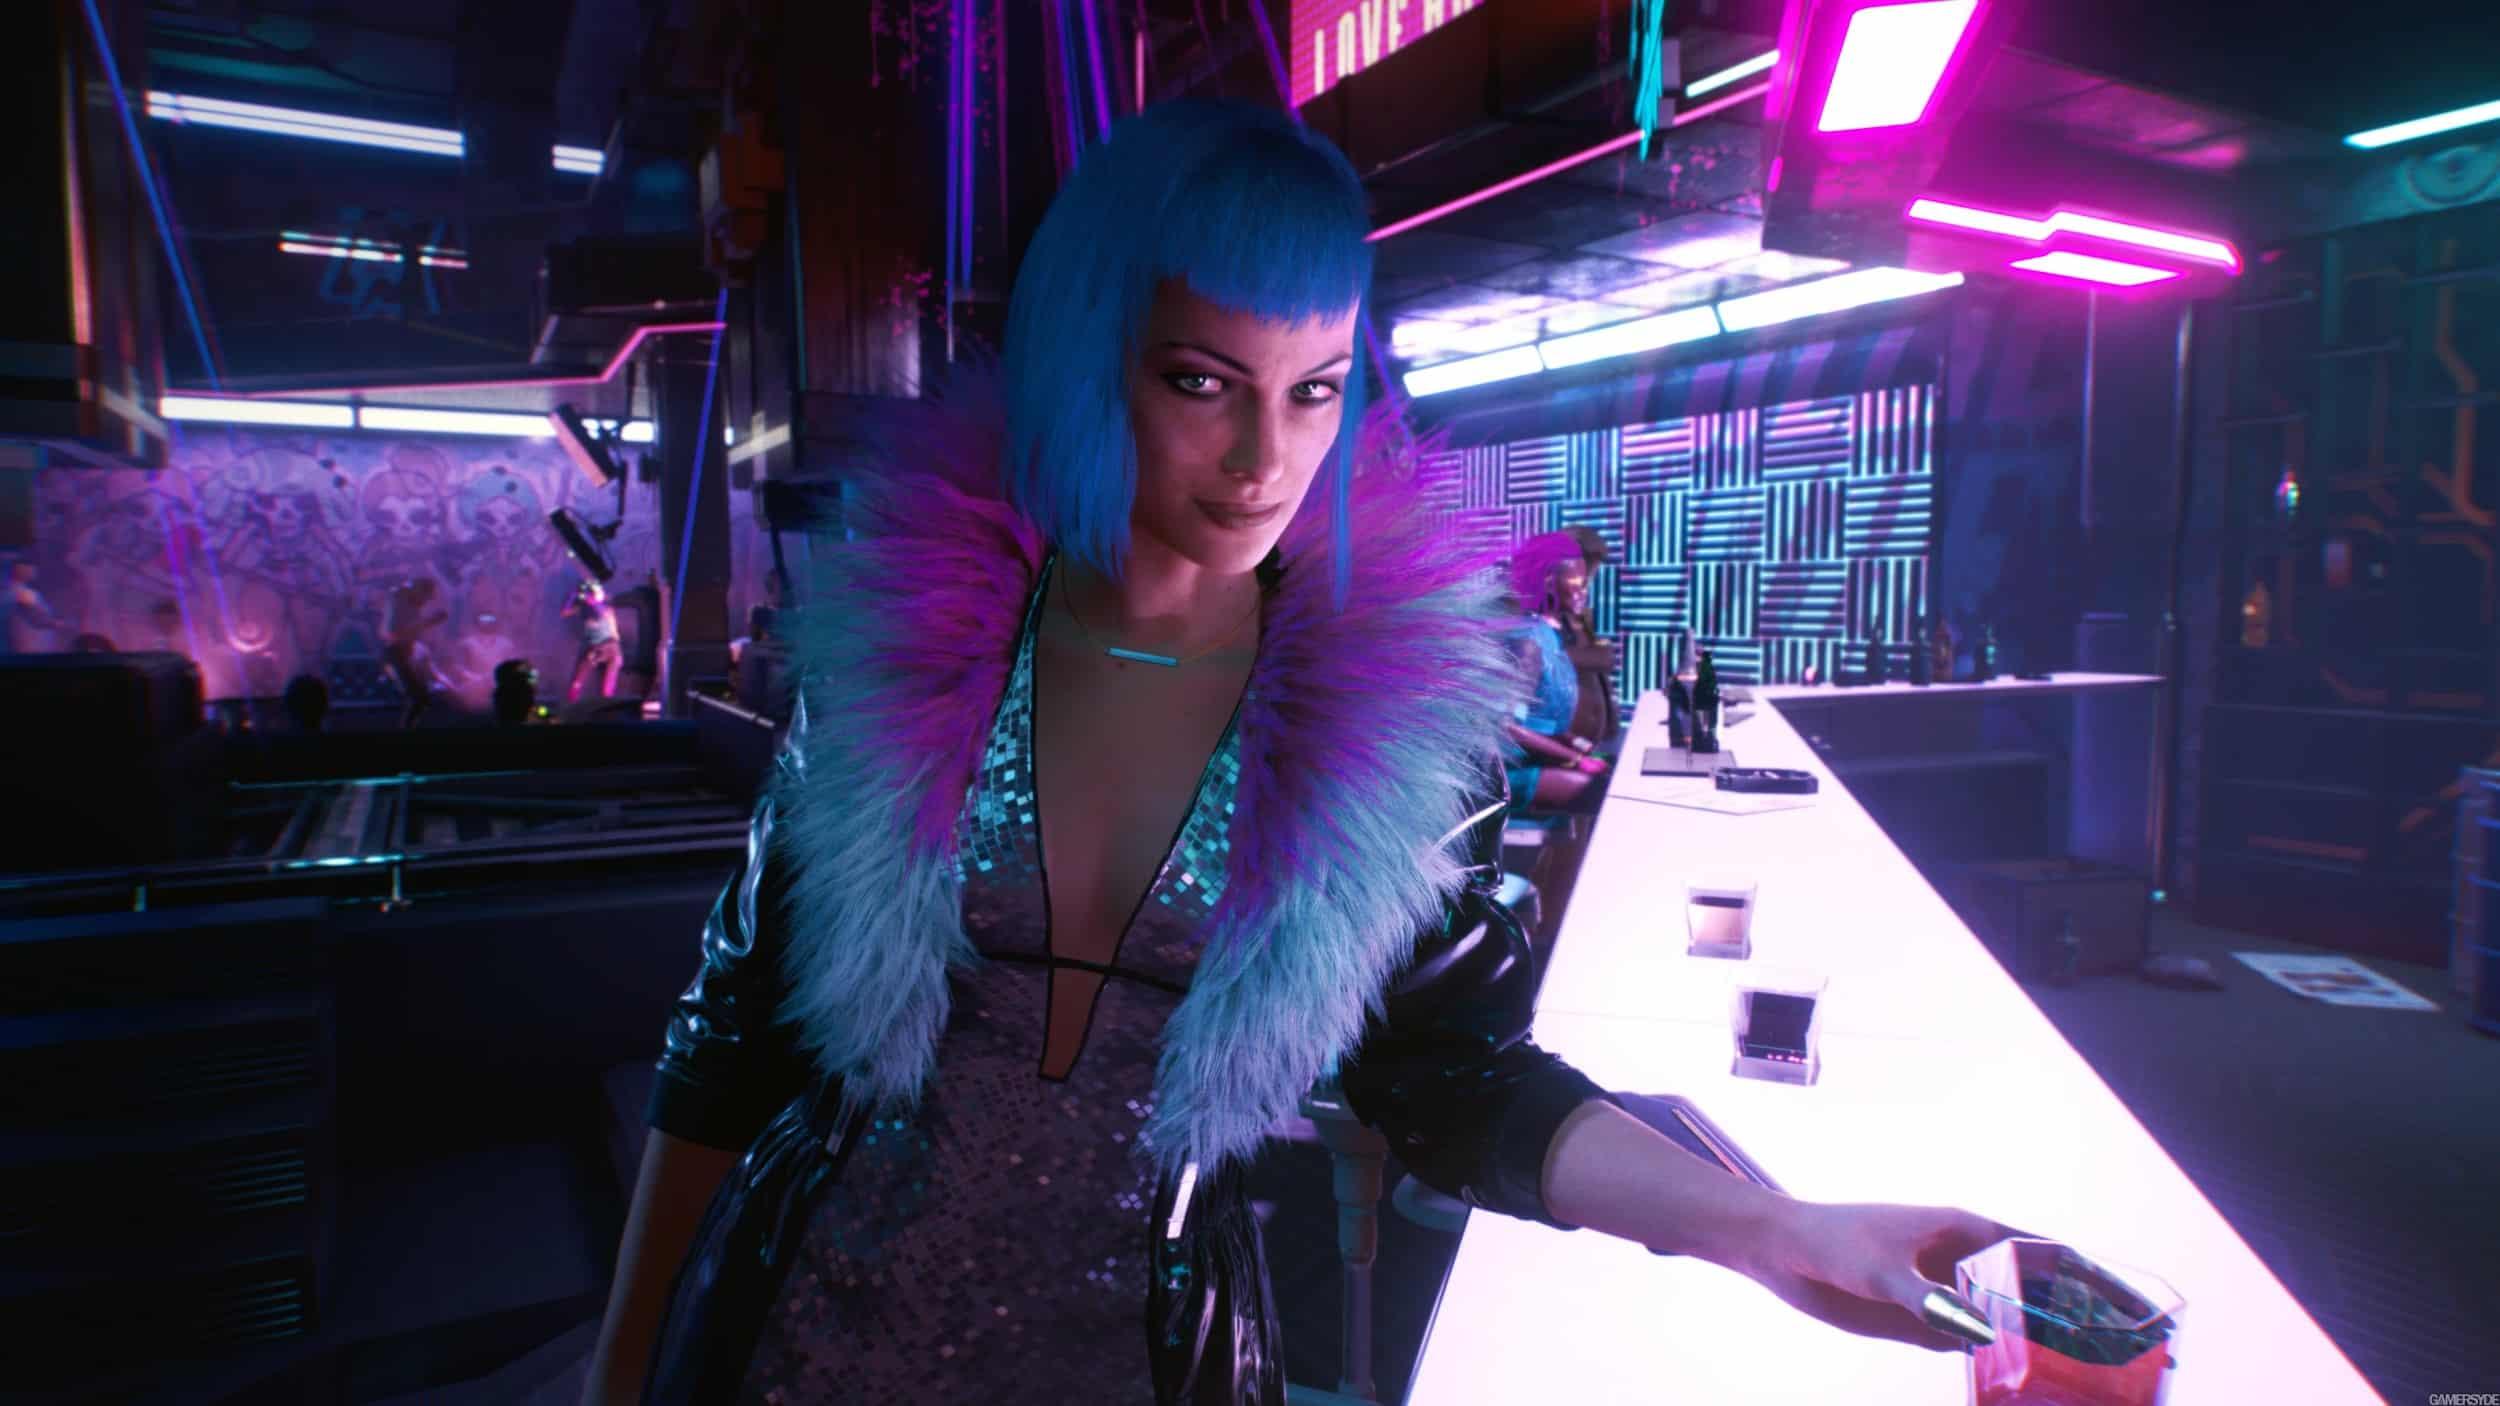 sexy lady in cyberpunk